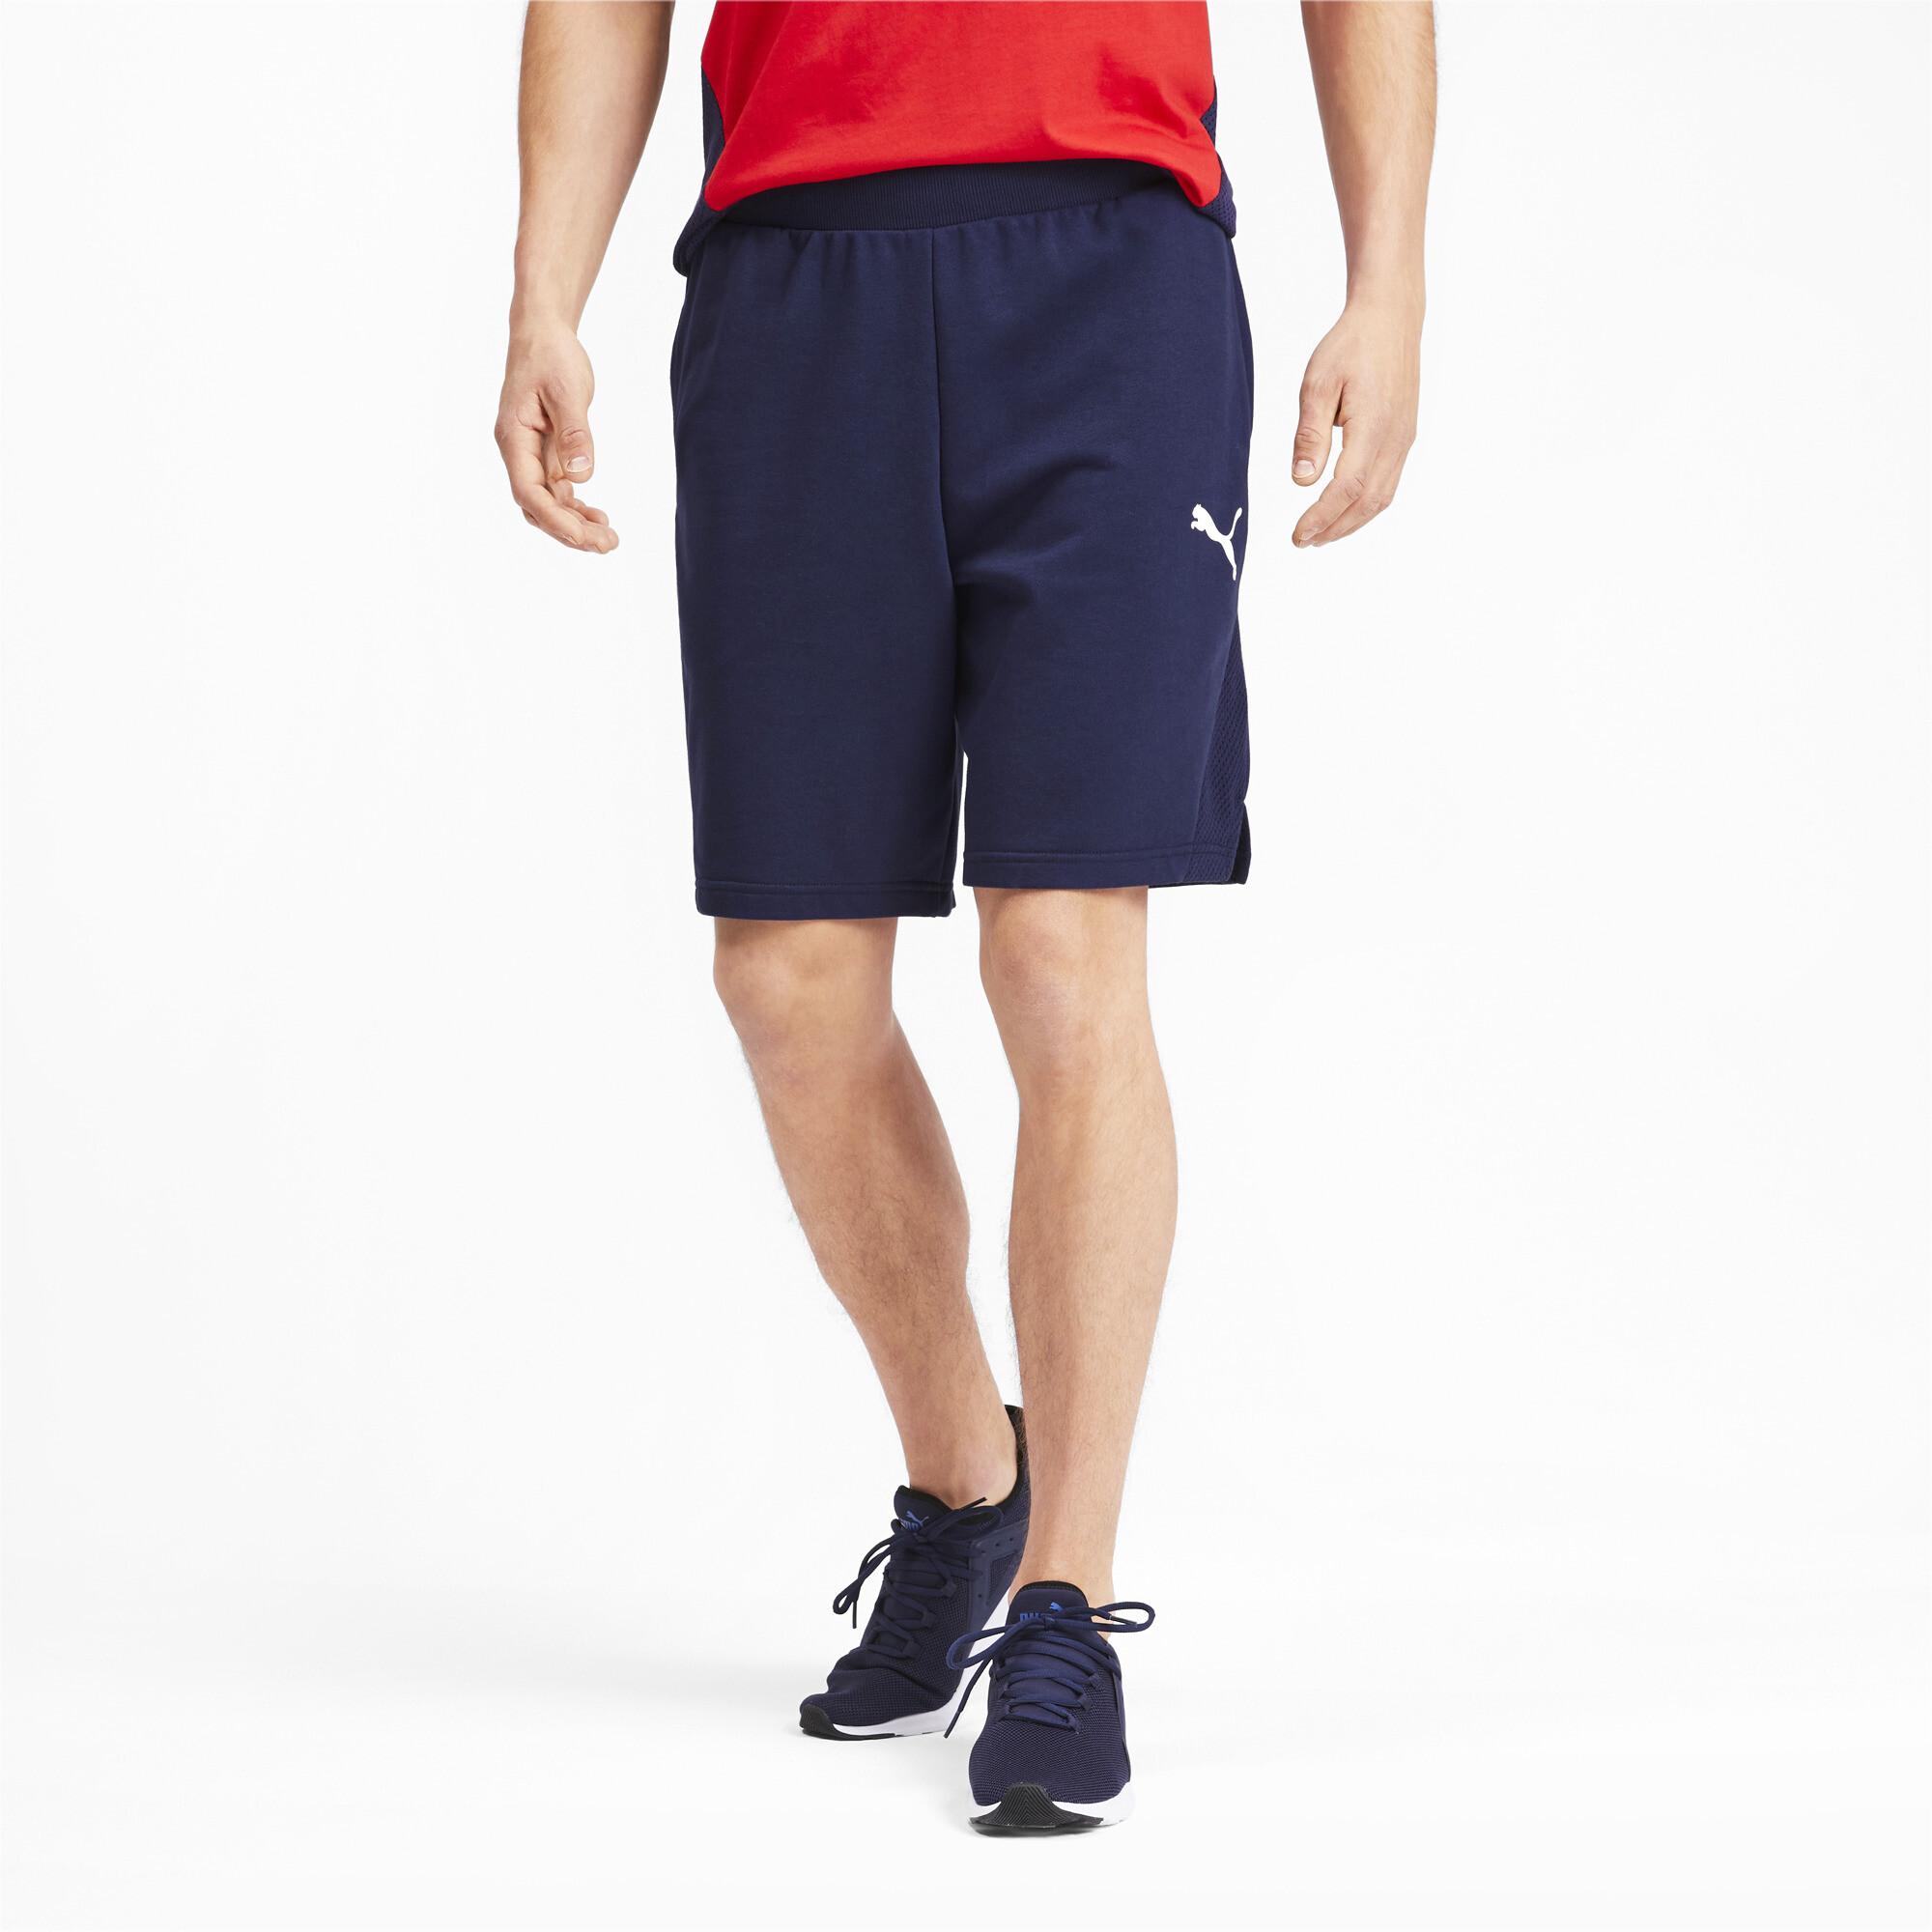 PUMA-Modern-Sports-Men-039-s-Shorts-Men-Knitted-Shorts-Basics thumbnail 14